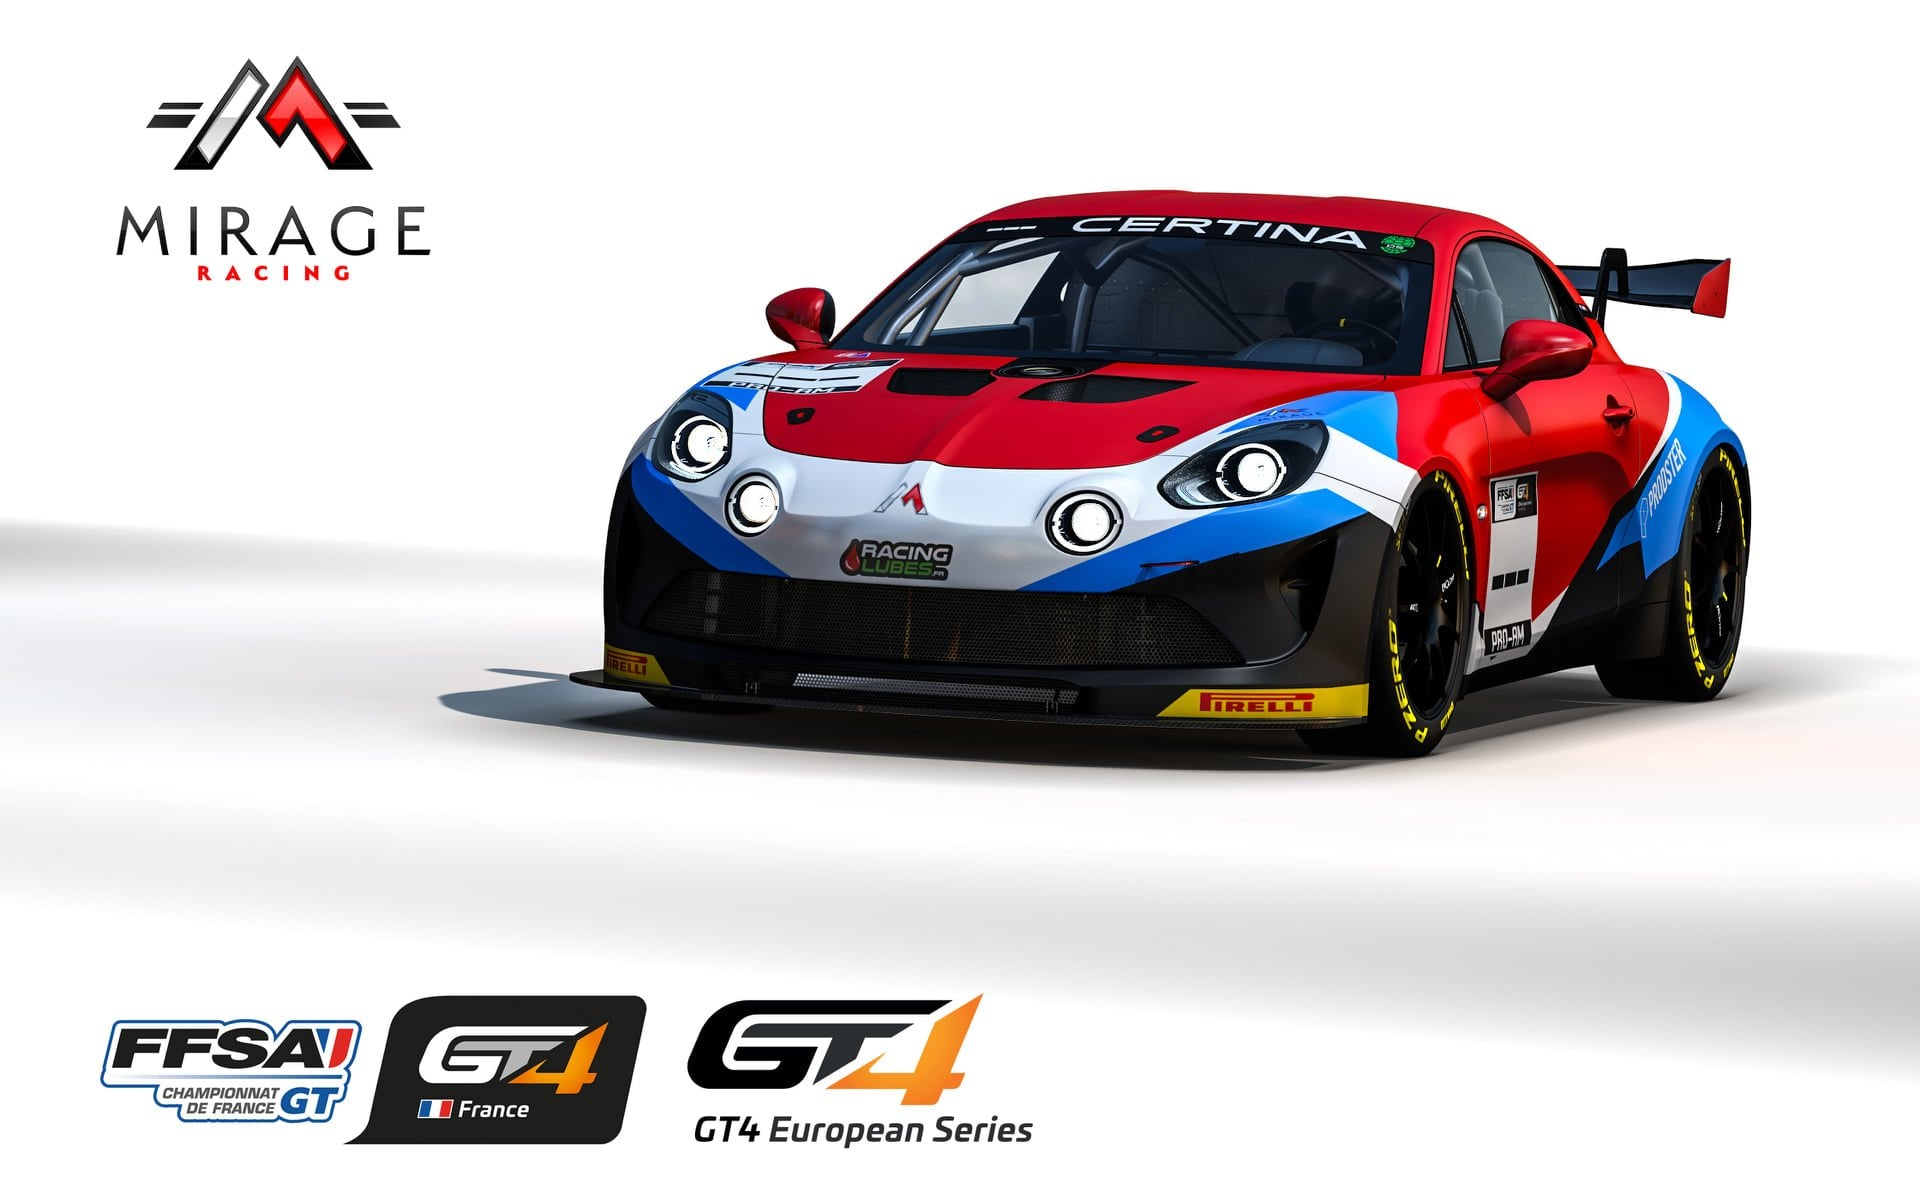 Alpine A110 GT4 Mirage Racing 2021 - 1